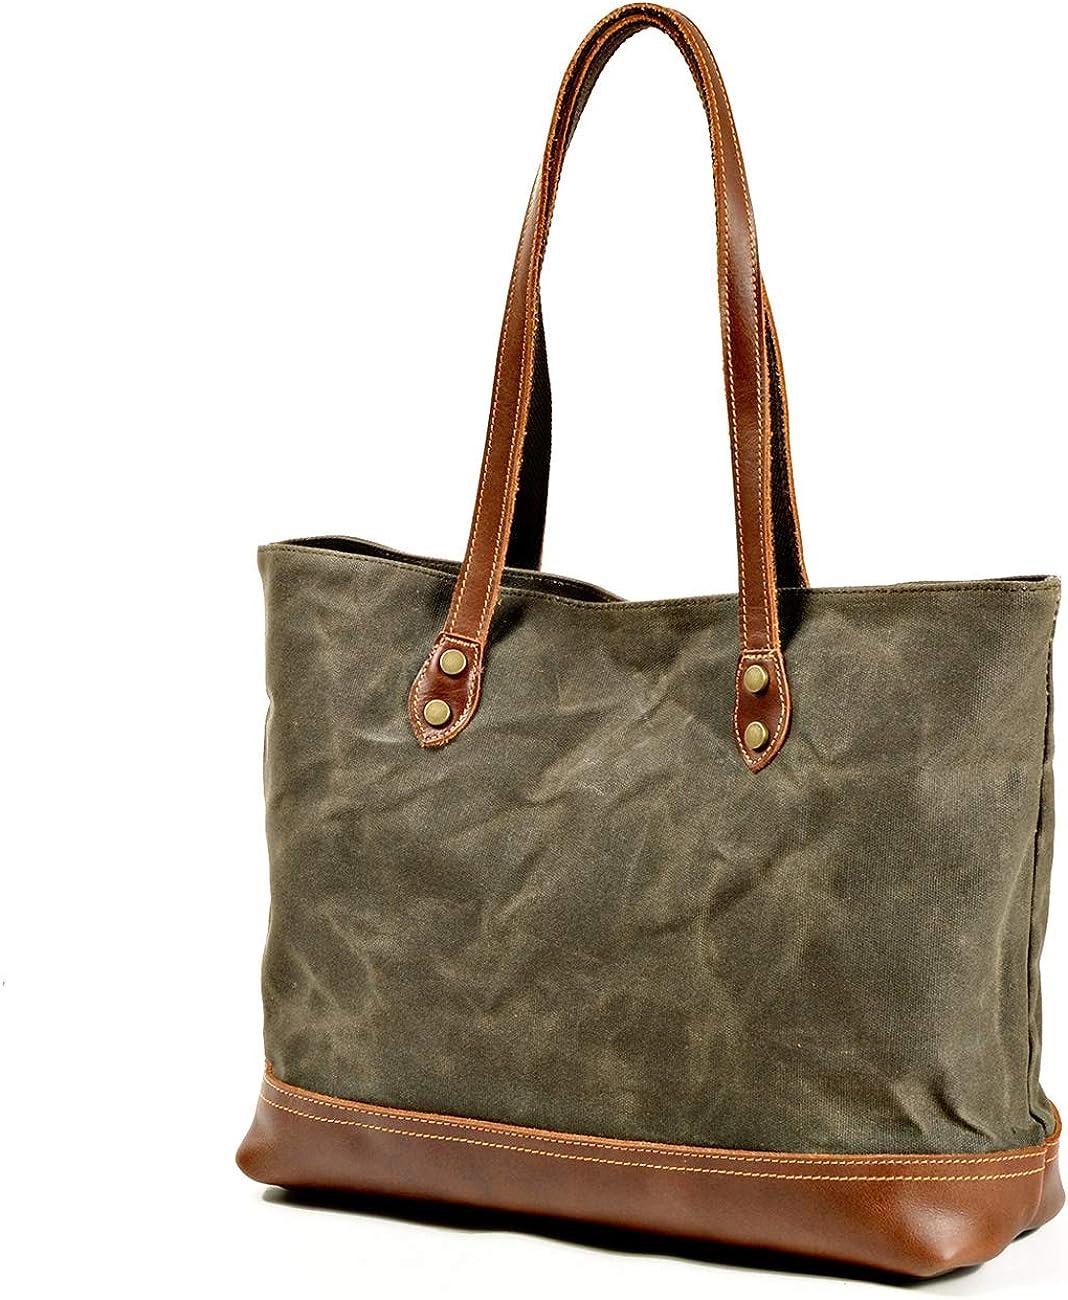 Jeelow Waxed Canvas Shoulder Tote Weekender Bag Travel Handbags For Men /& Women Leather Handles Water Proof